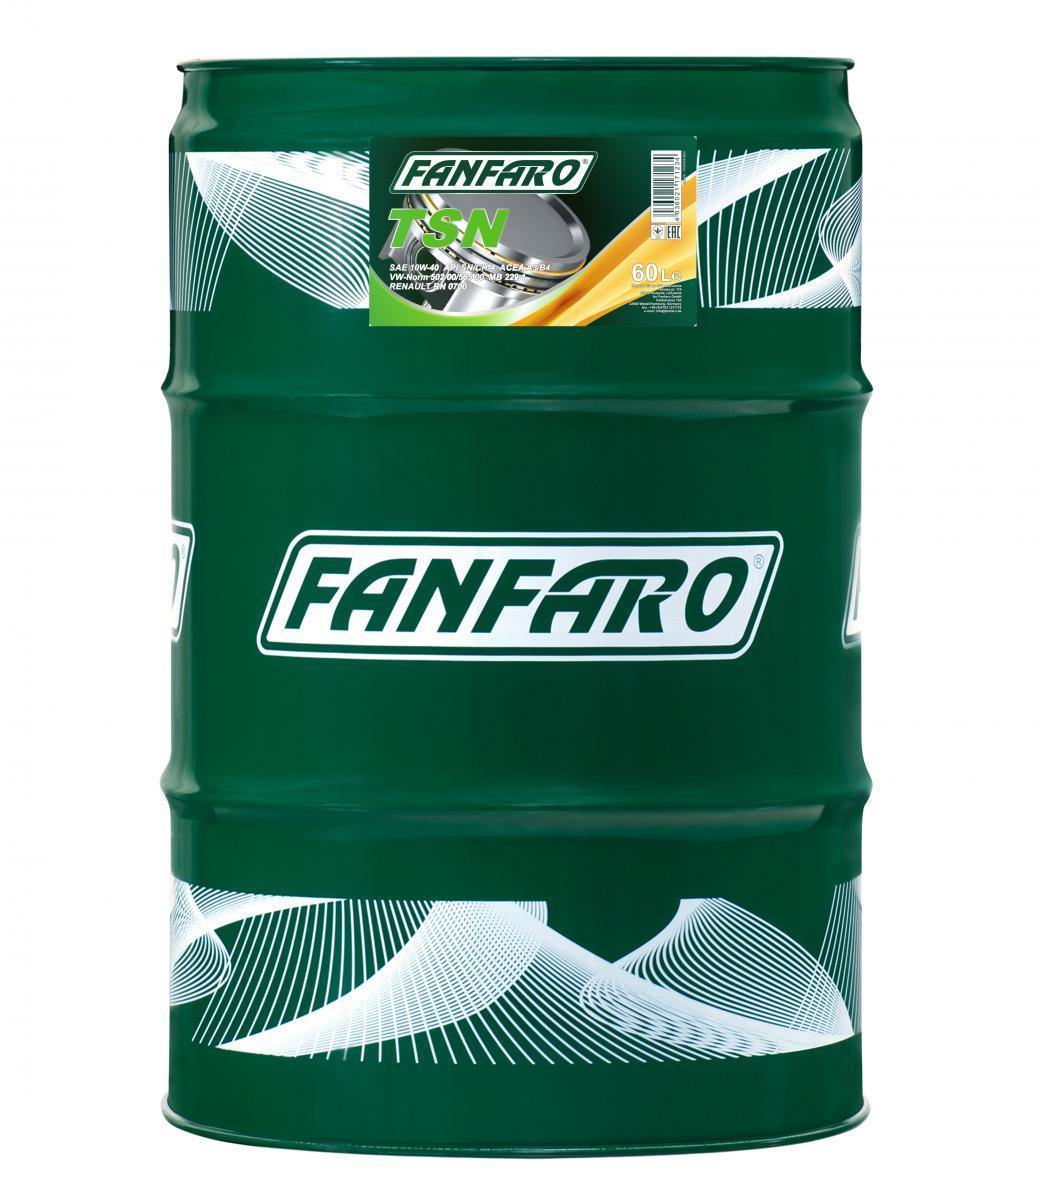 FF6704-60 FANFARO Profi Line, TSN 10W-40, 60l, Synthetiköl Motoröl FF6704-60 günstig kaufen